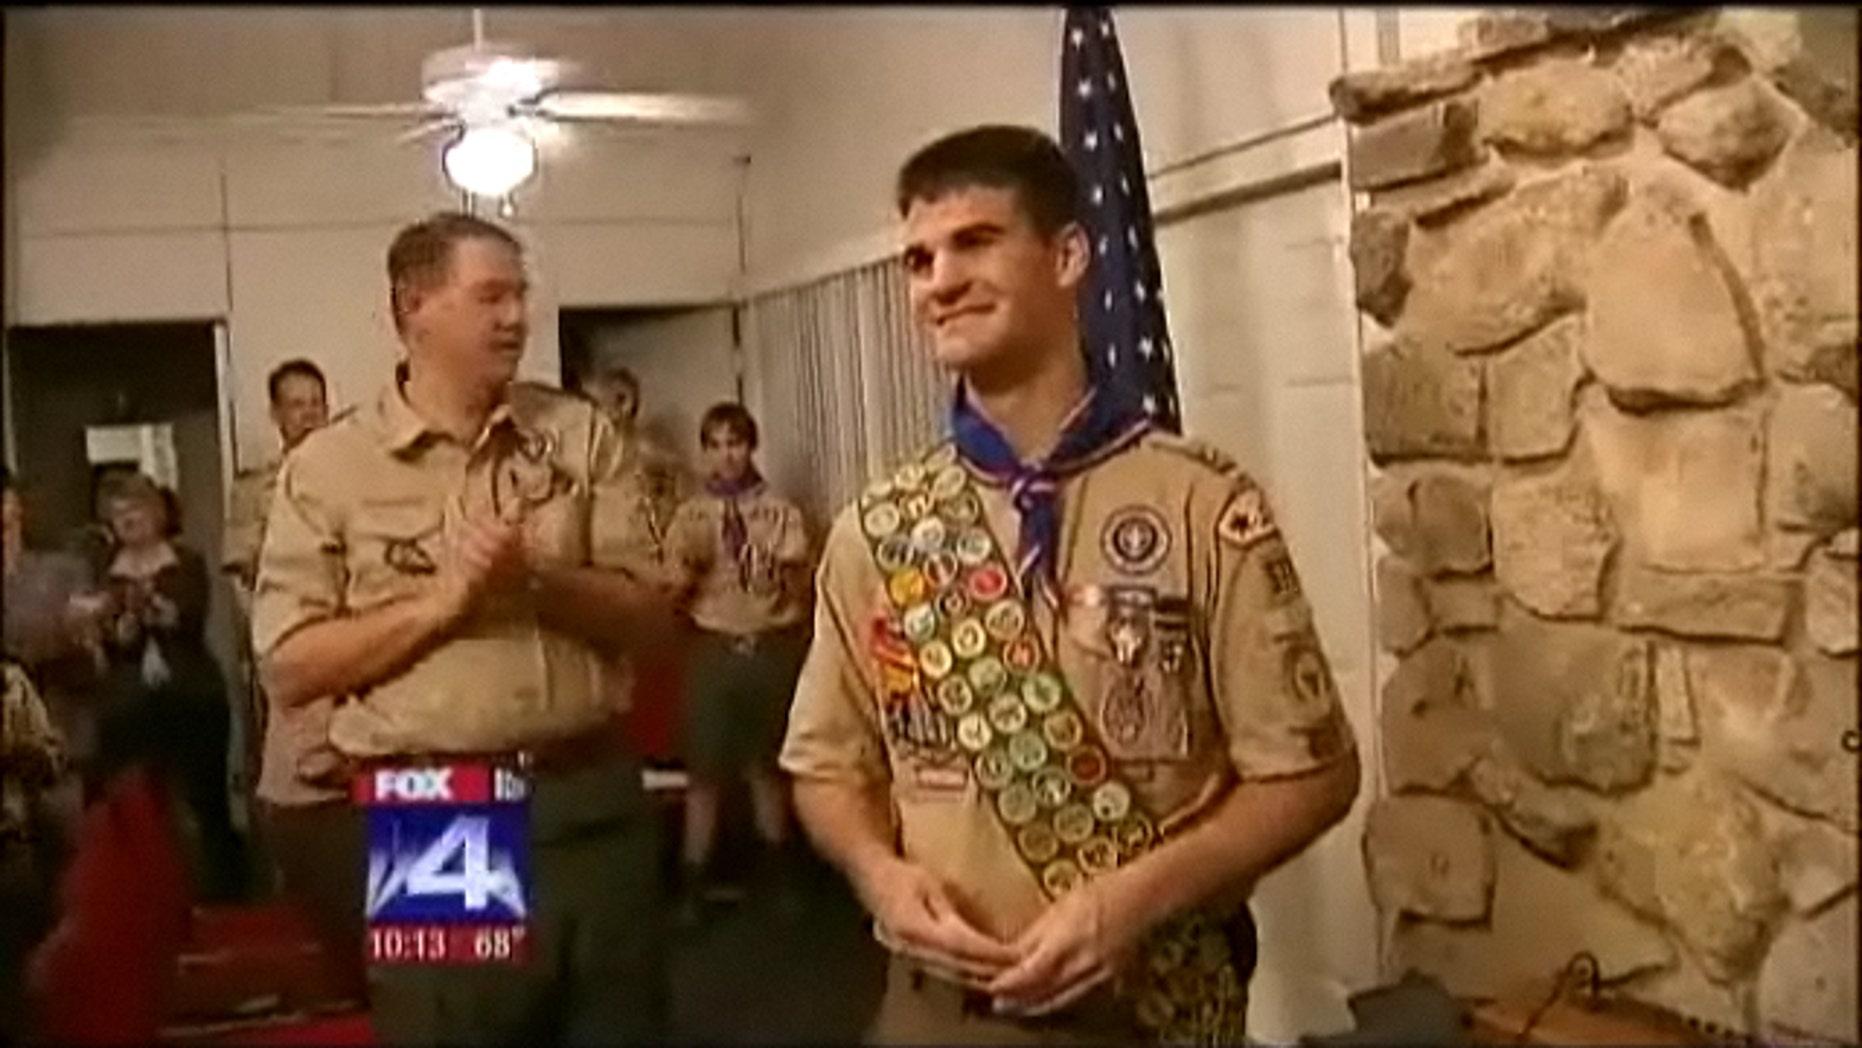 April 9, 2012: Dallas-are Eagle Scout Roland Salatino receives 17th Palm award.